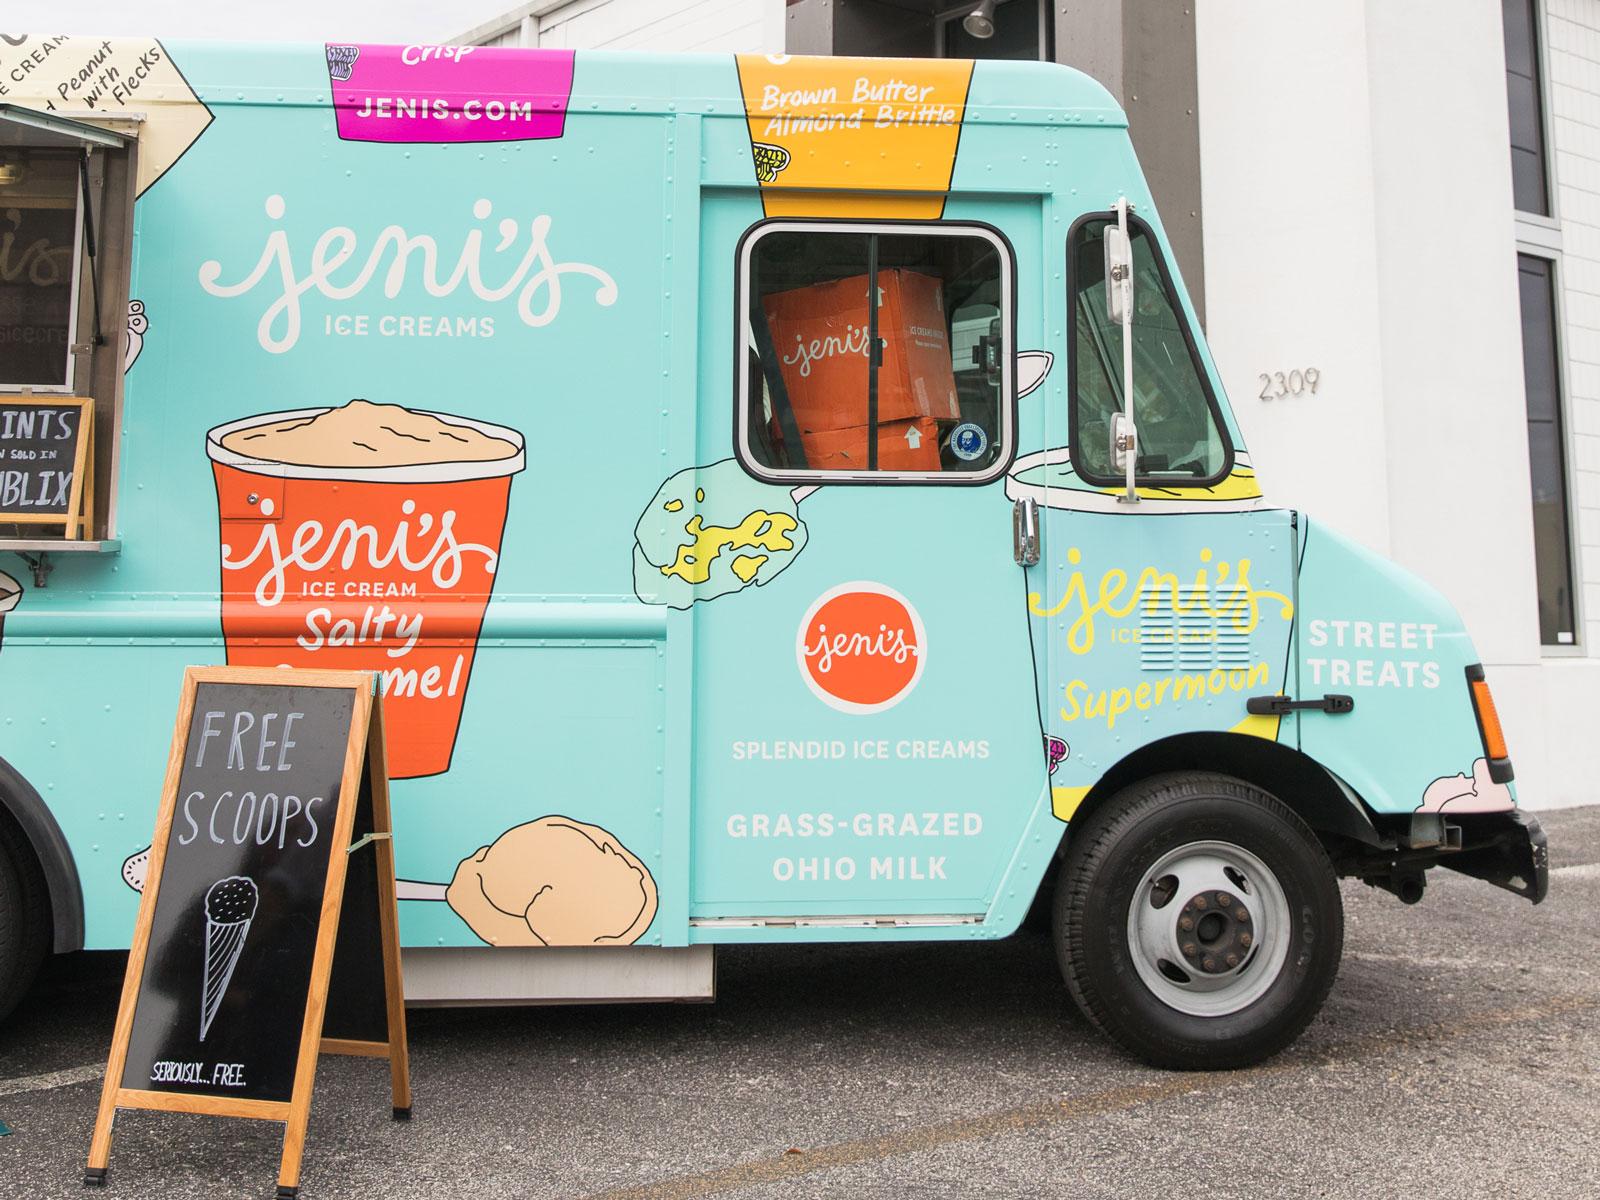 Jeni's Splendid Ice Cream Truck